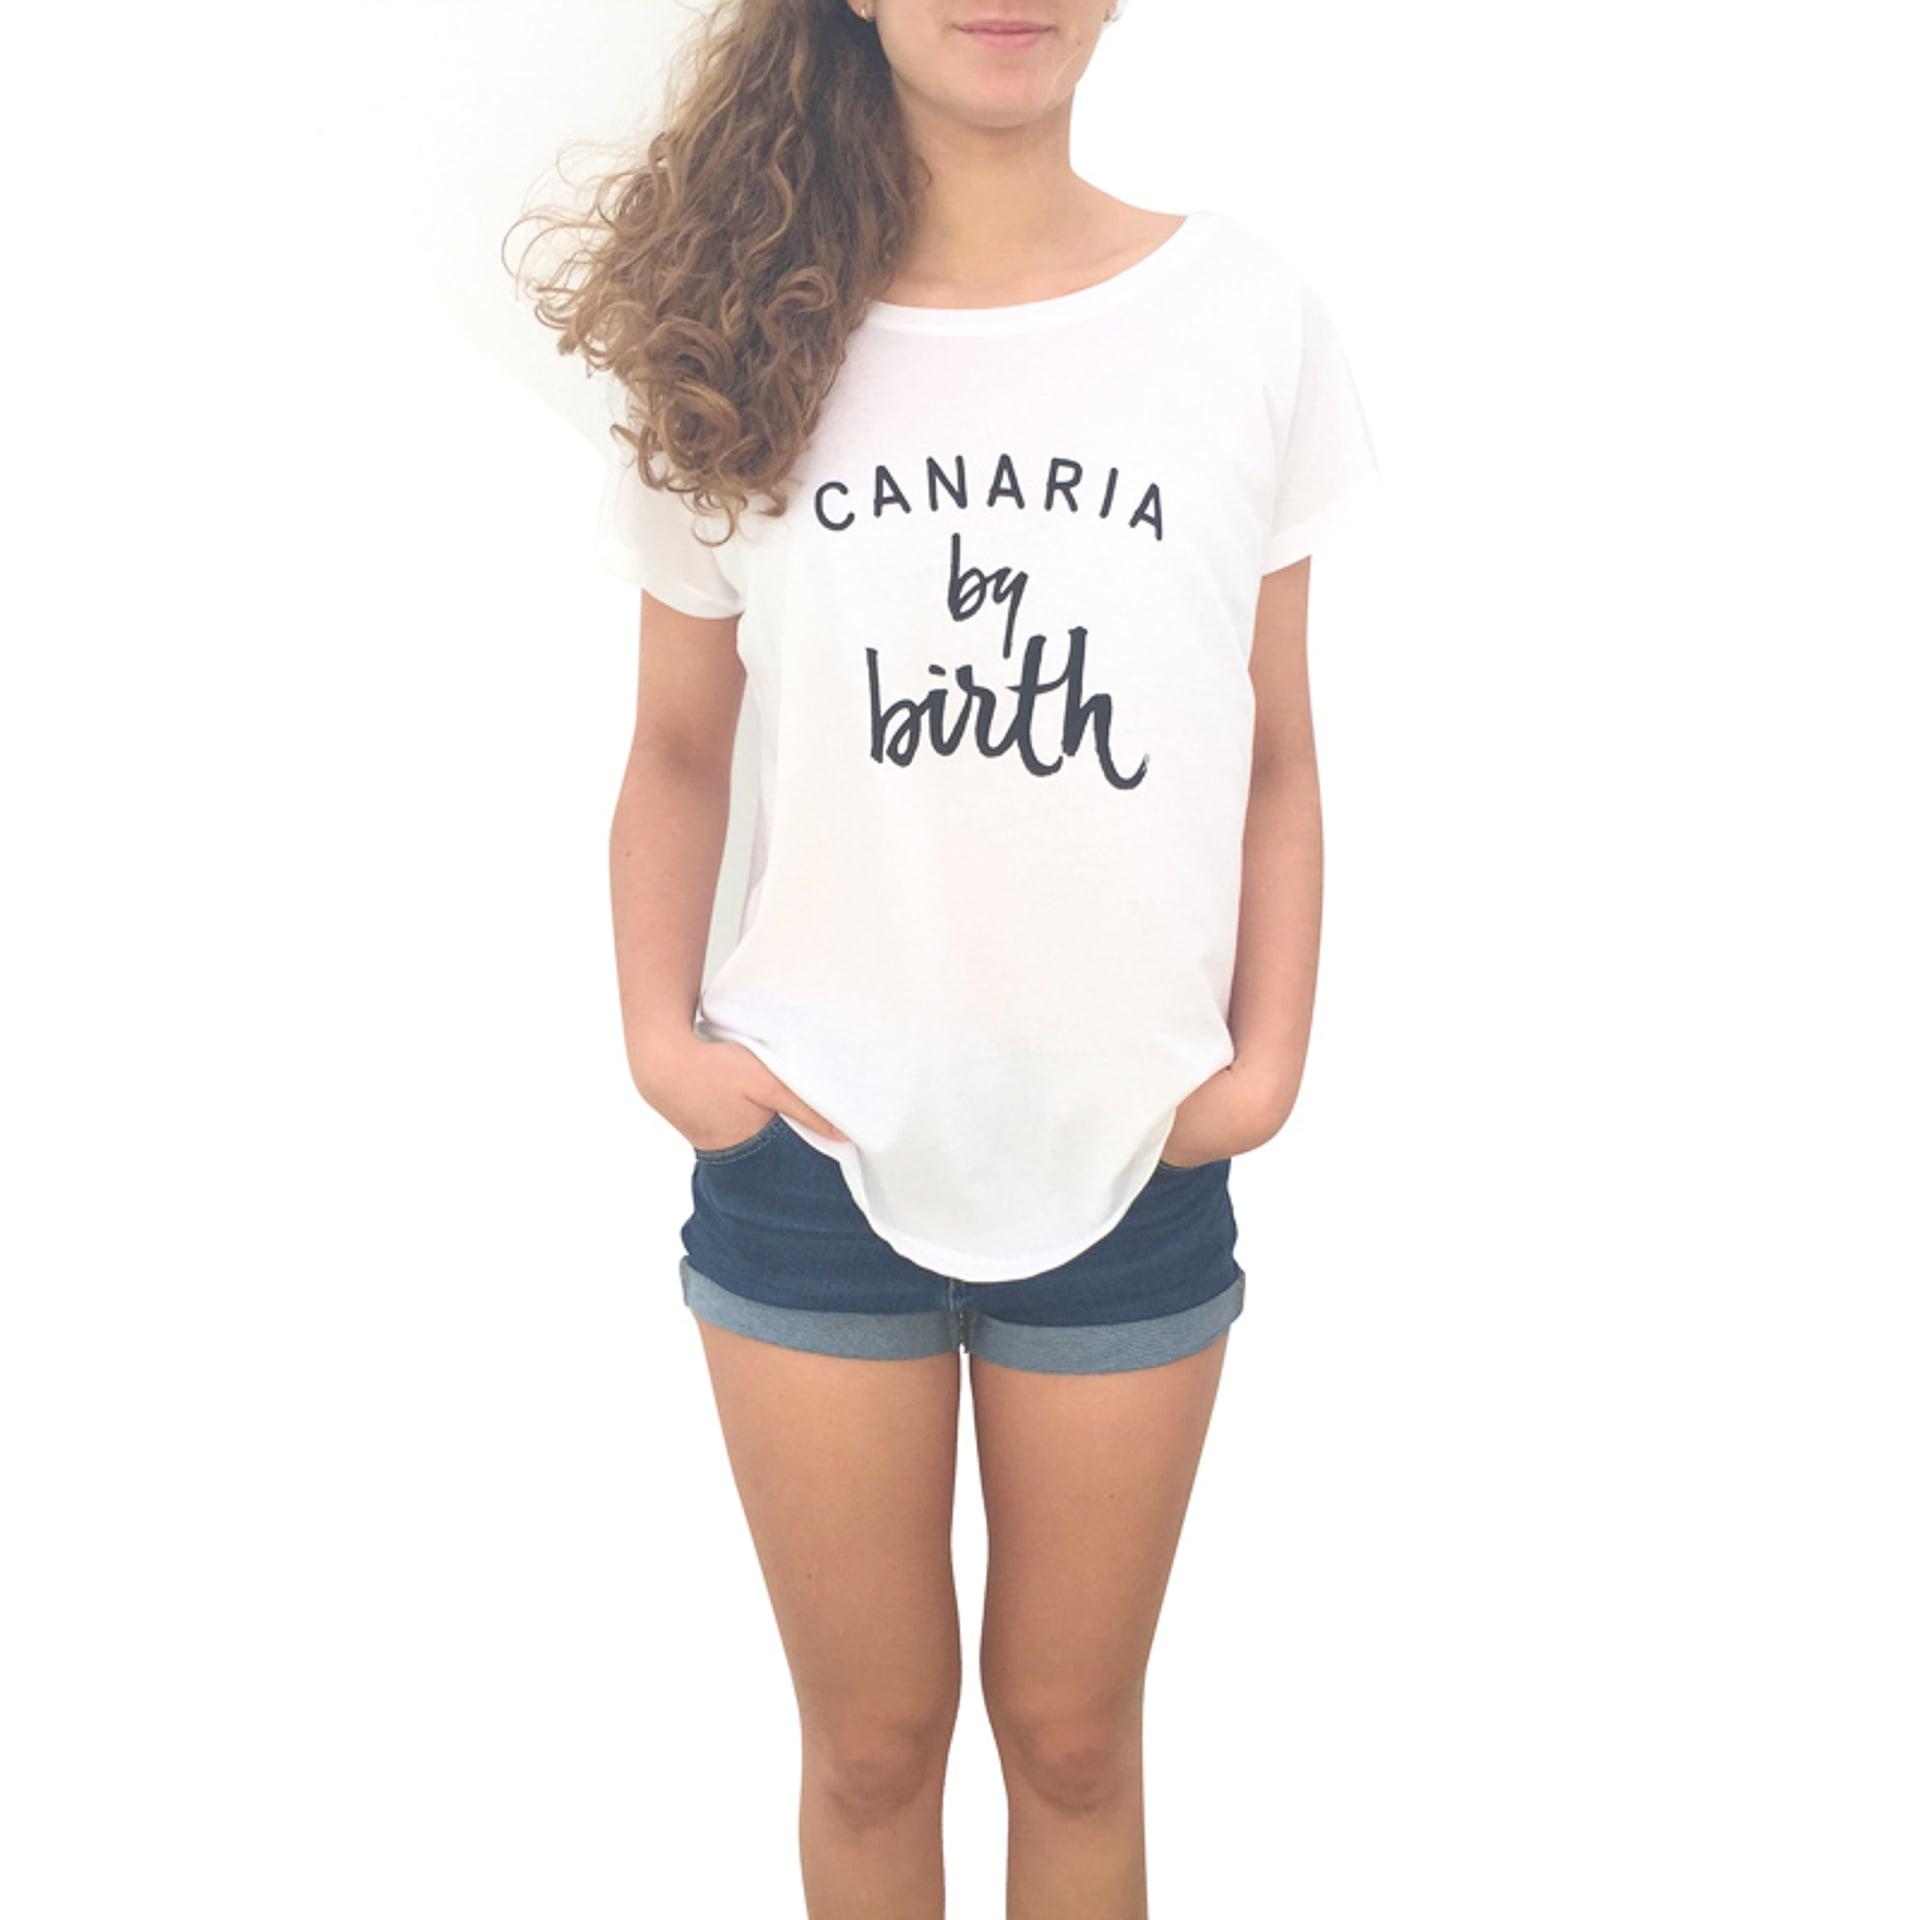 Canaria_by_birth-woman-white-model-tshirt